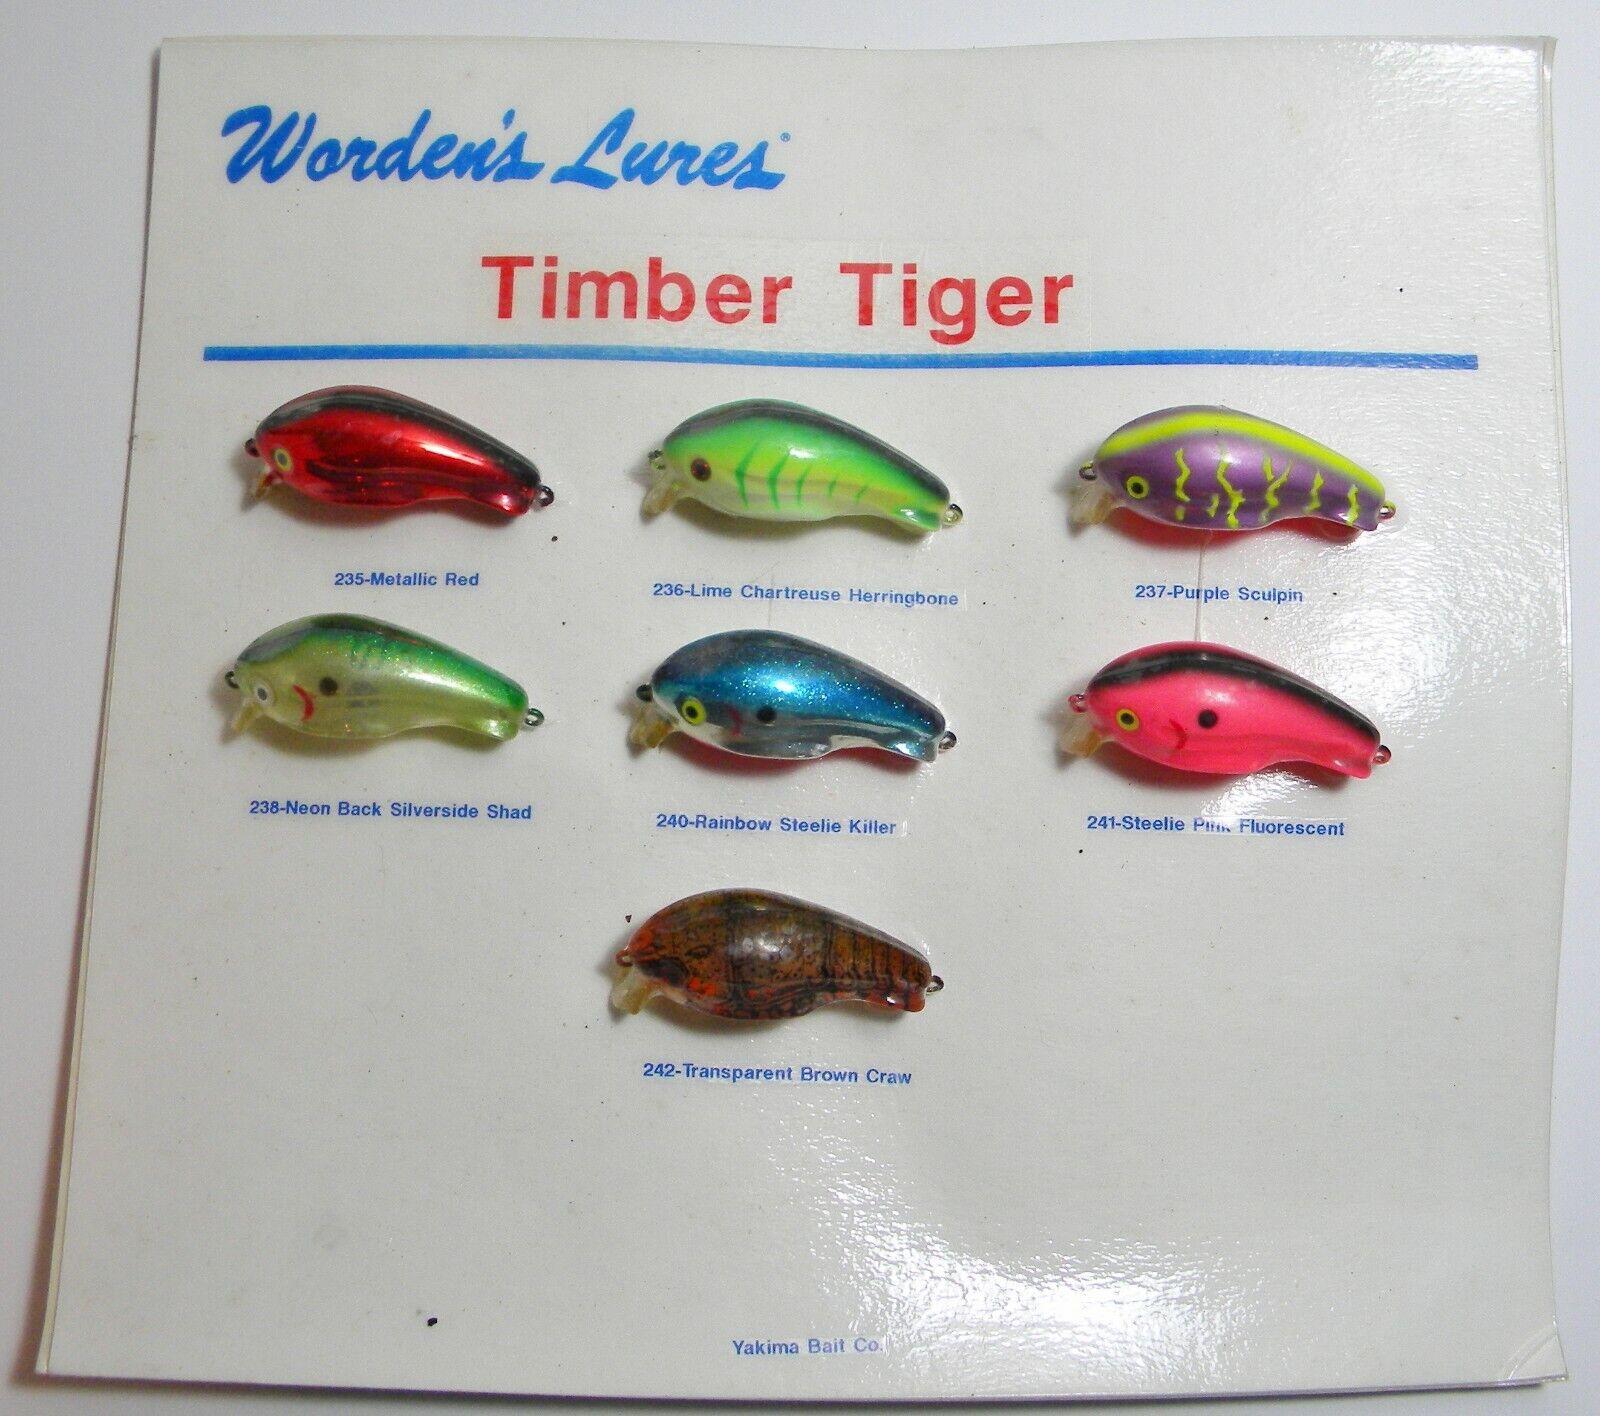 Worden's Lures Timber Tiger Salesman Display Card Yakima Bait Co.